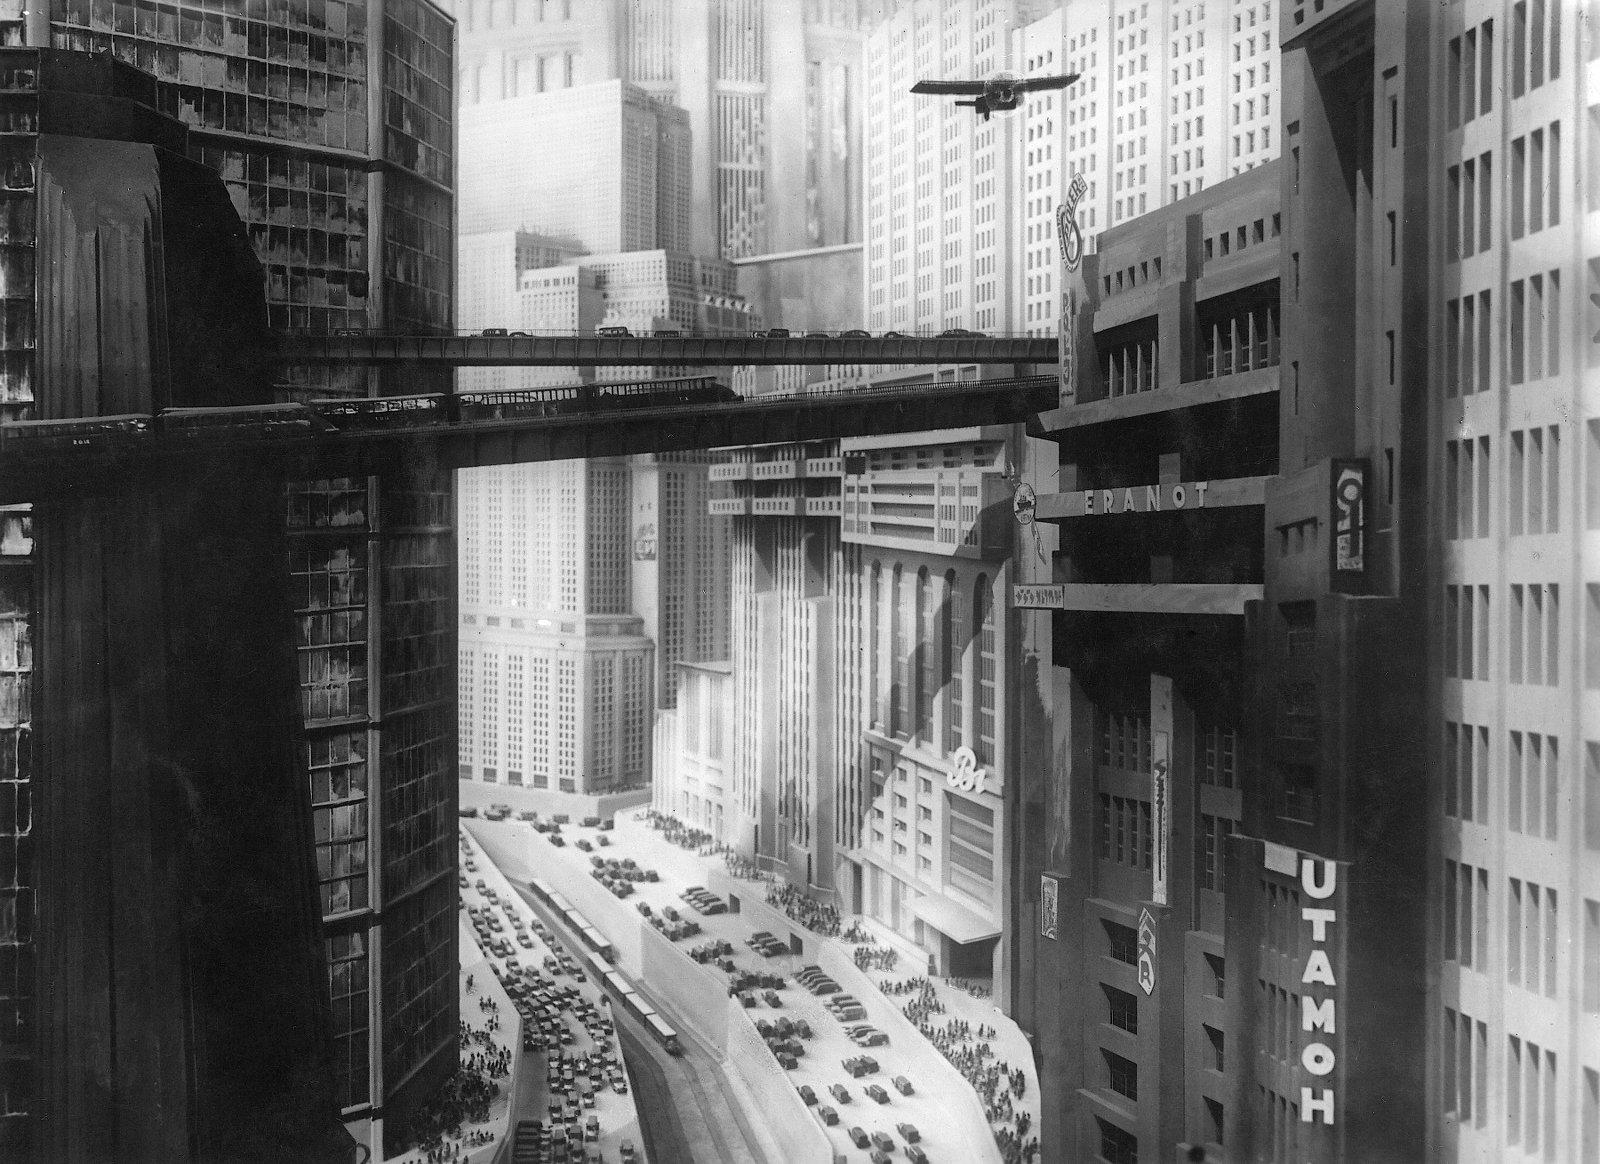 Architektur in Metropolis. (Bild: Murnau-Stiftung)